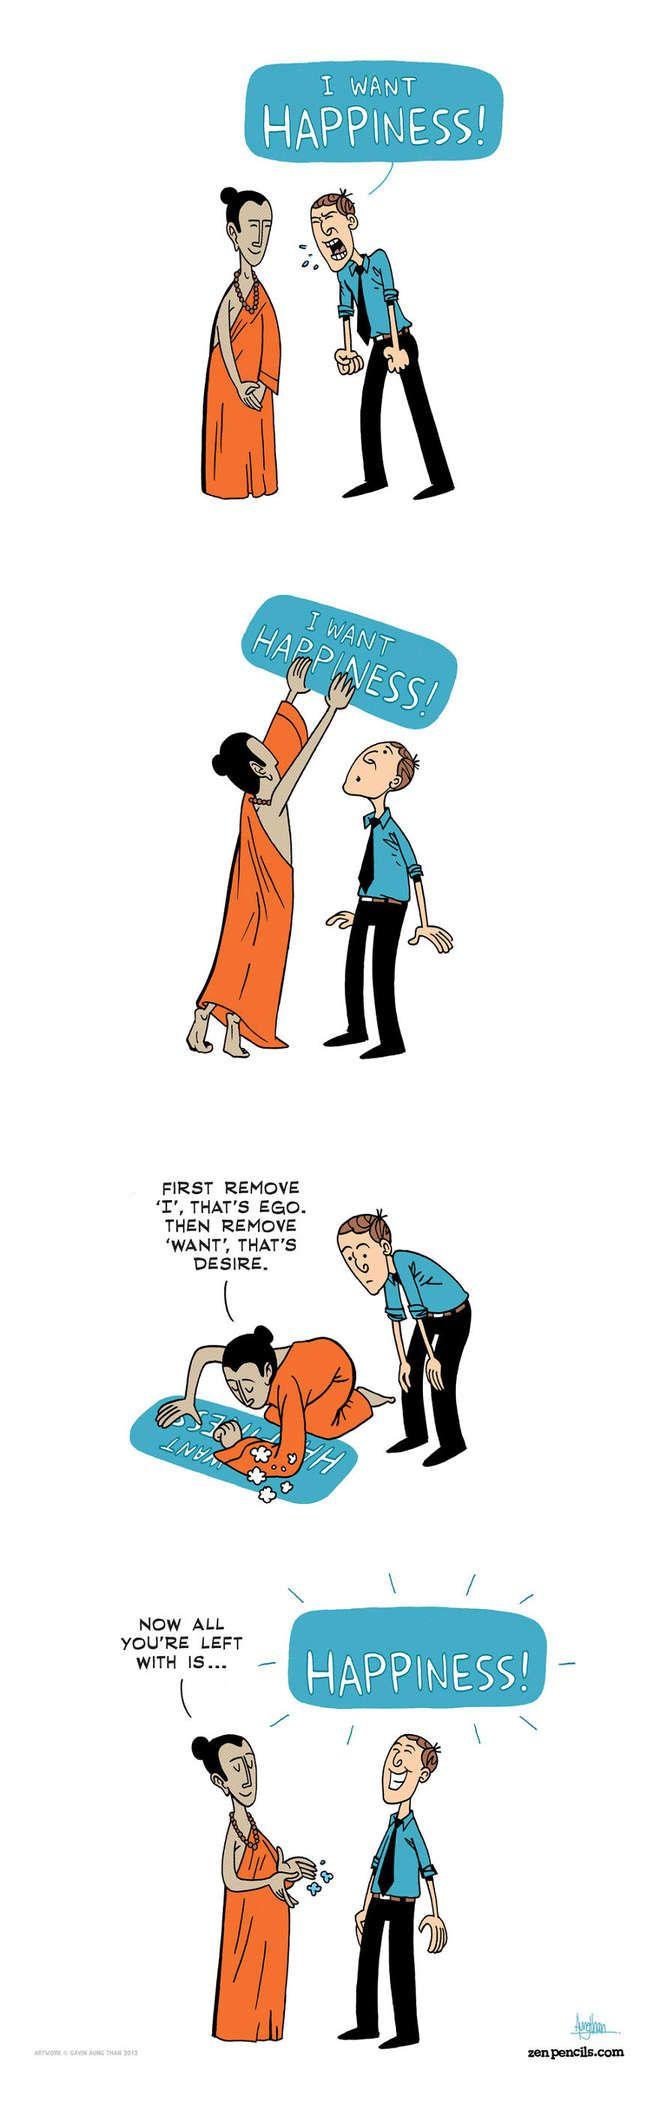 Inspiration: les citations inspirantes des plus grands philosophes illustrées en cartoon